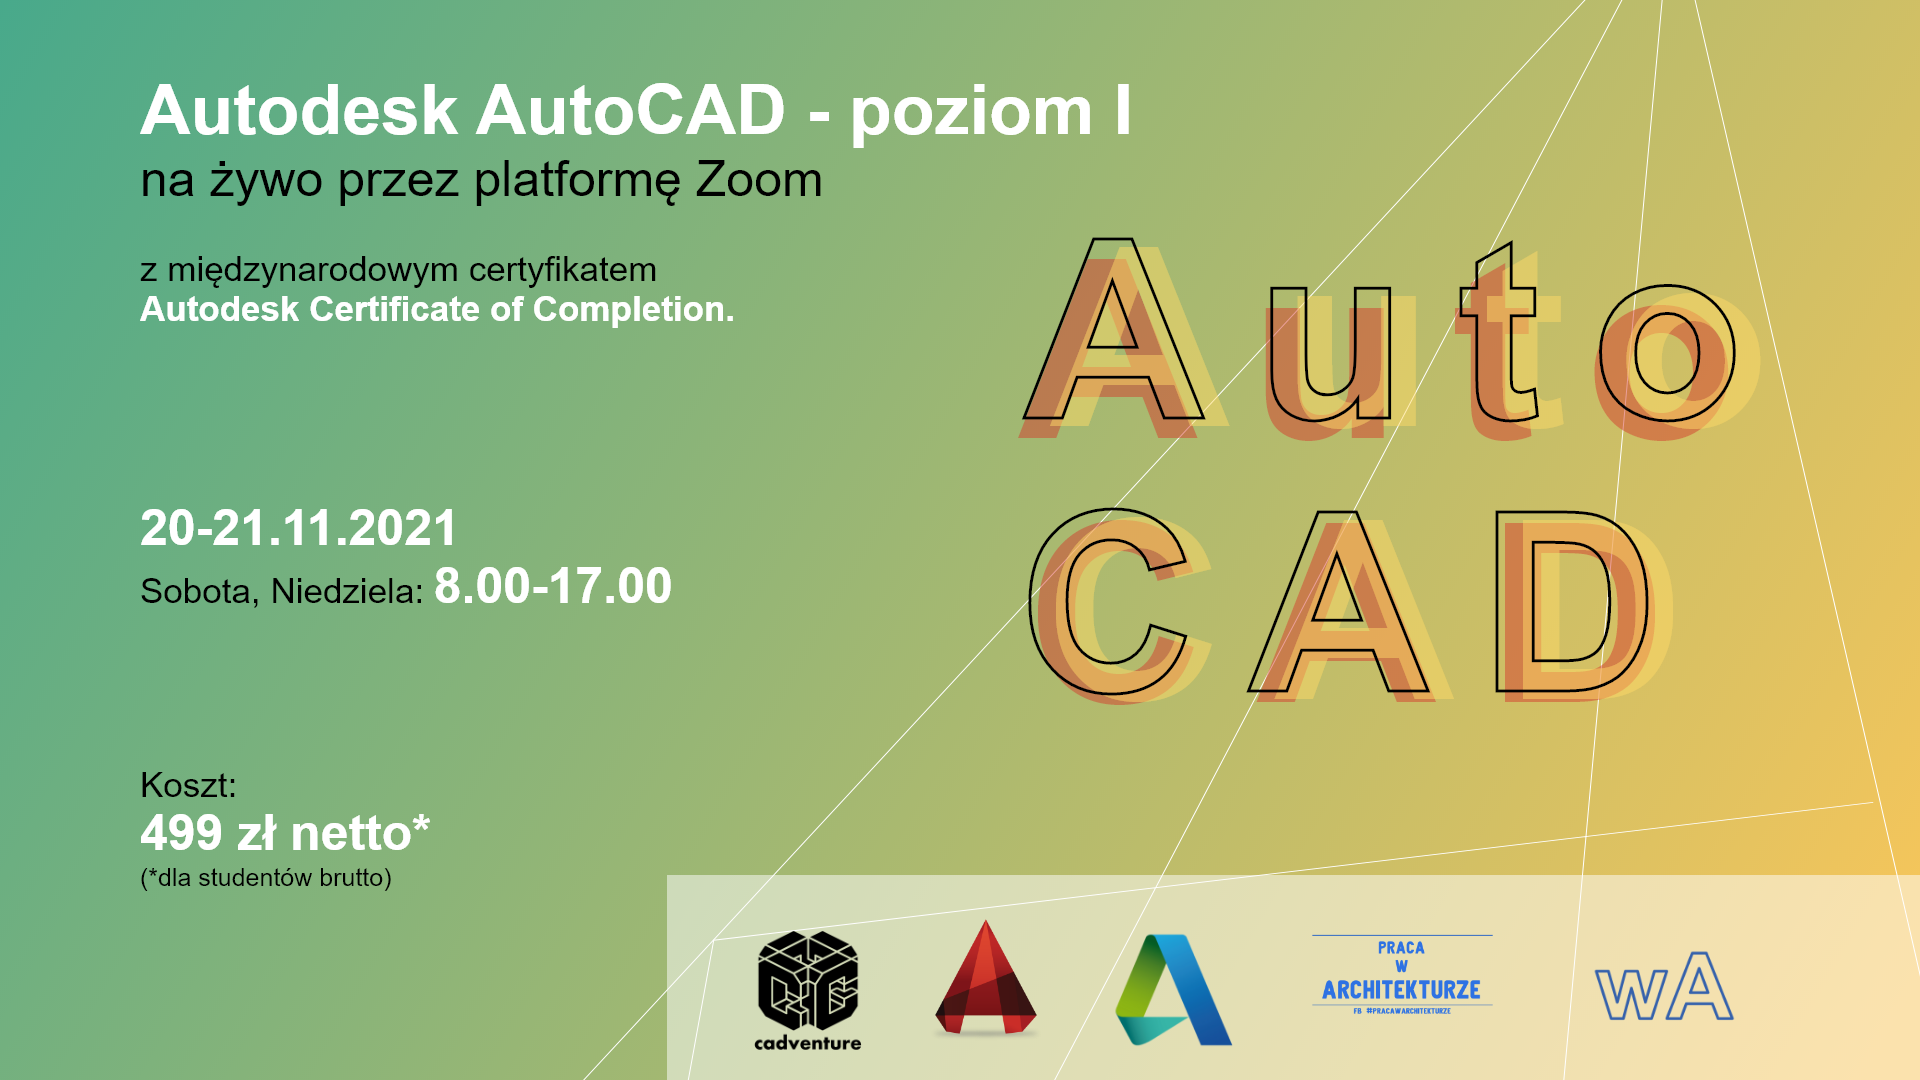 AutoCAD 20-21.11